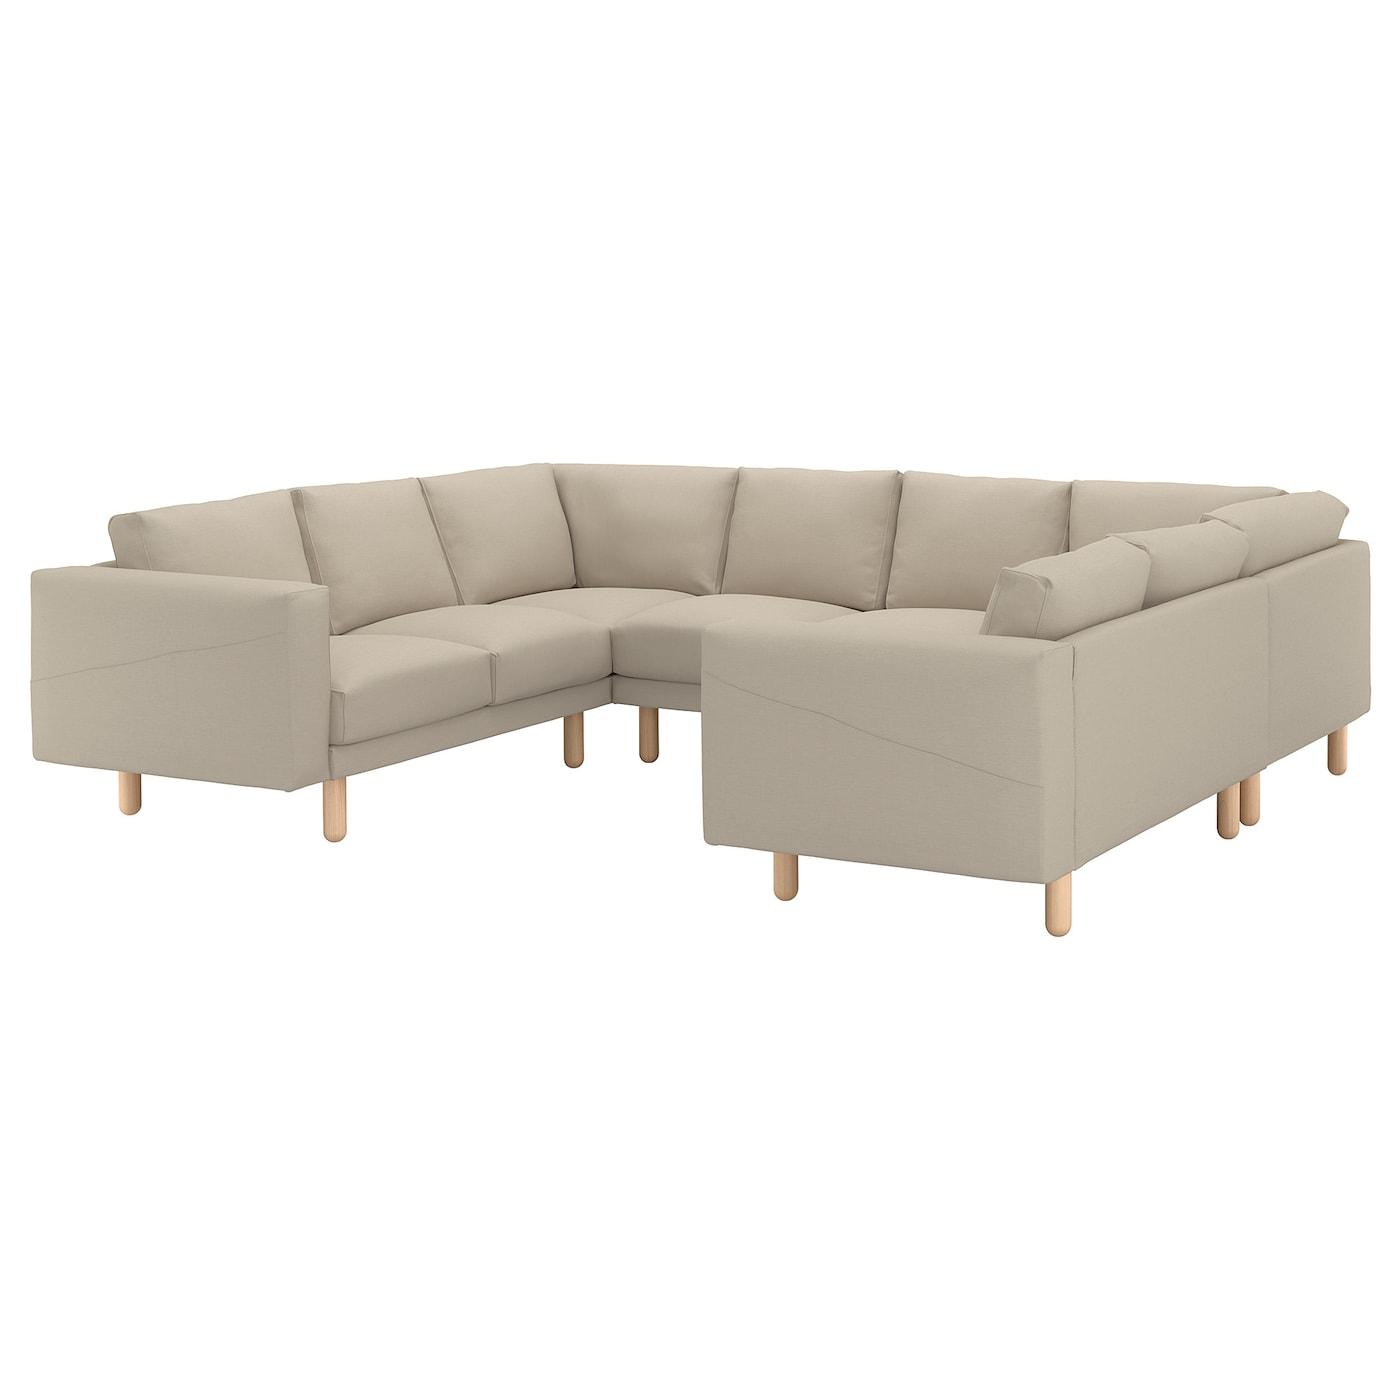 Iets Nieuws NORSBORG serie - IKEA @RW27